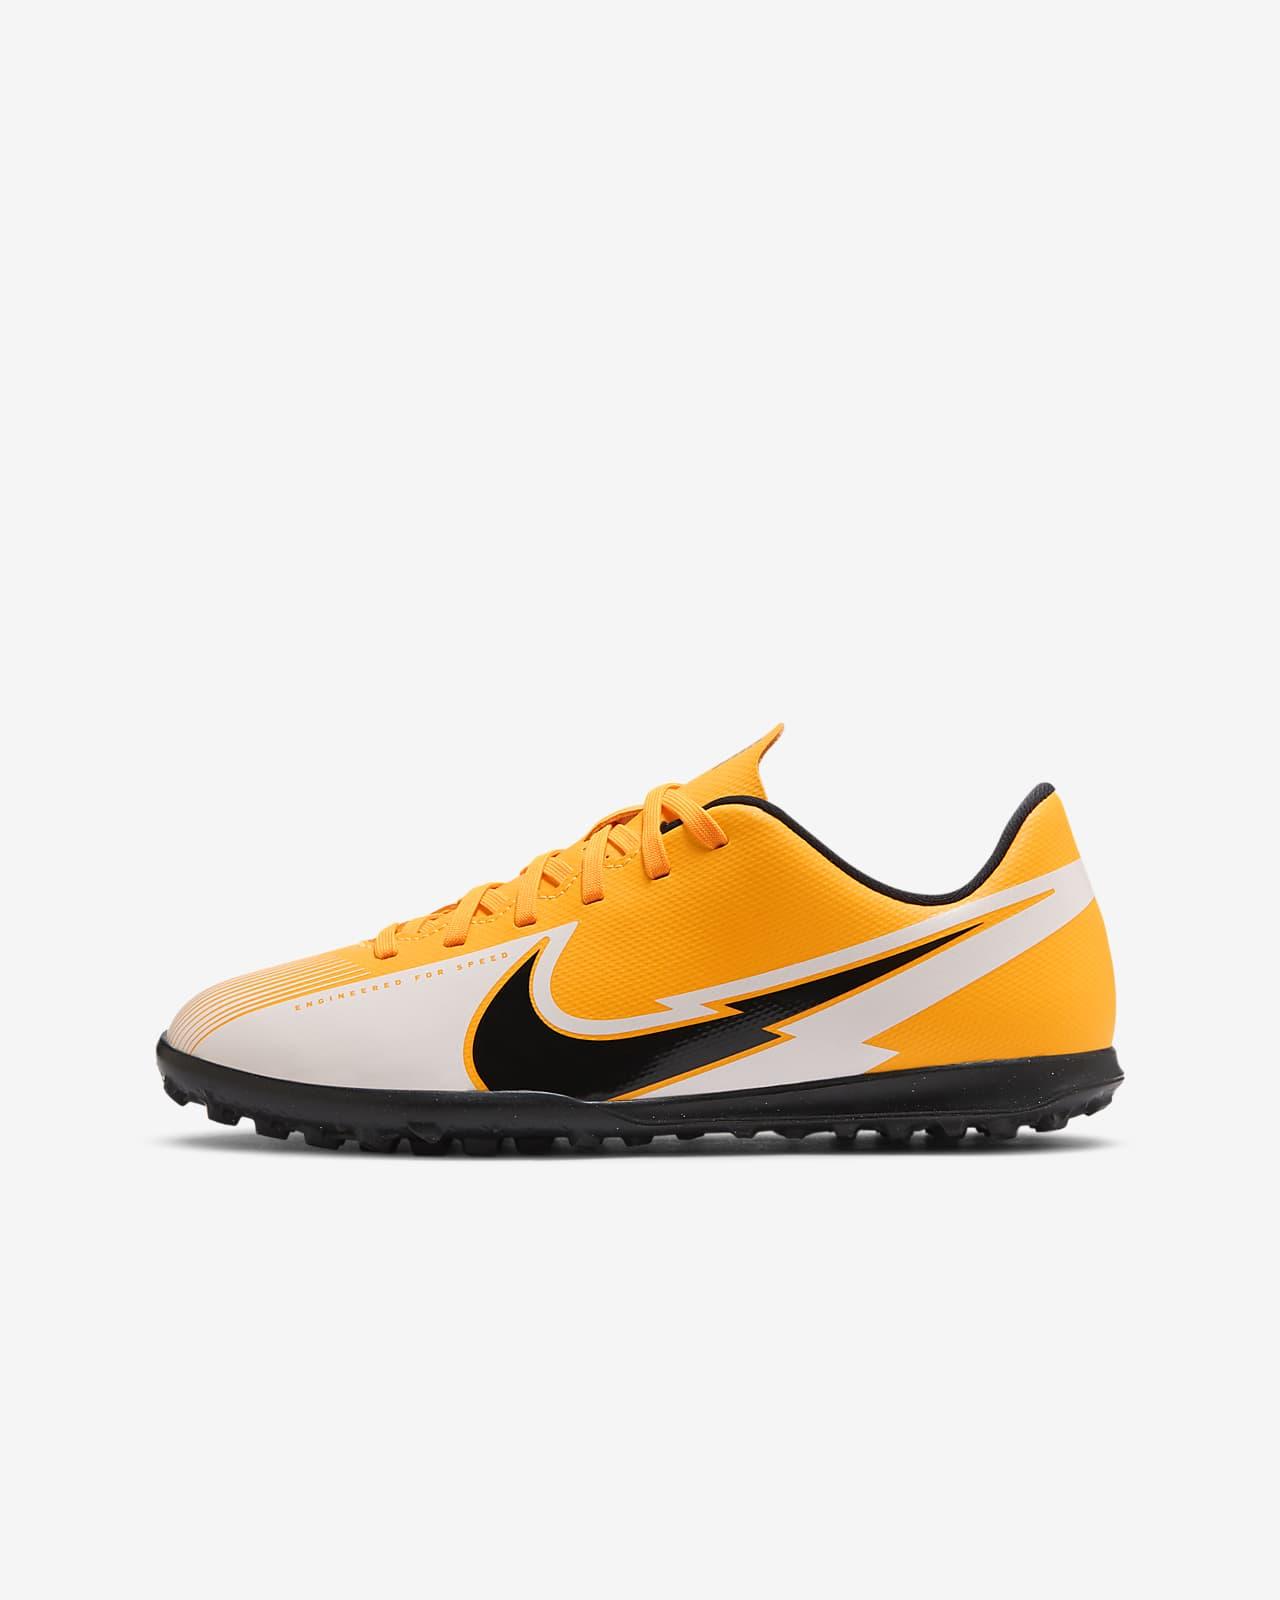 Nike Jr. Mercurial Vapor 13 Club TF Younger/Older Kids' Artificial-Turf Football Shoe